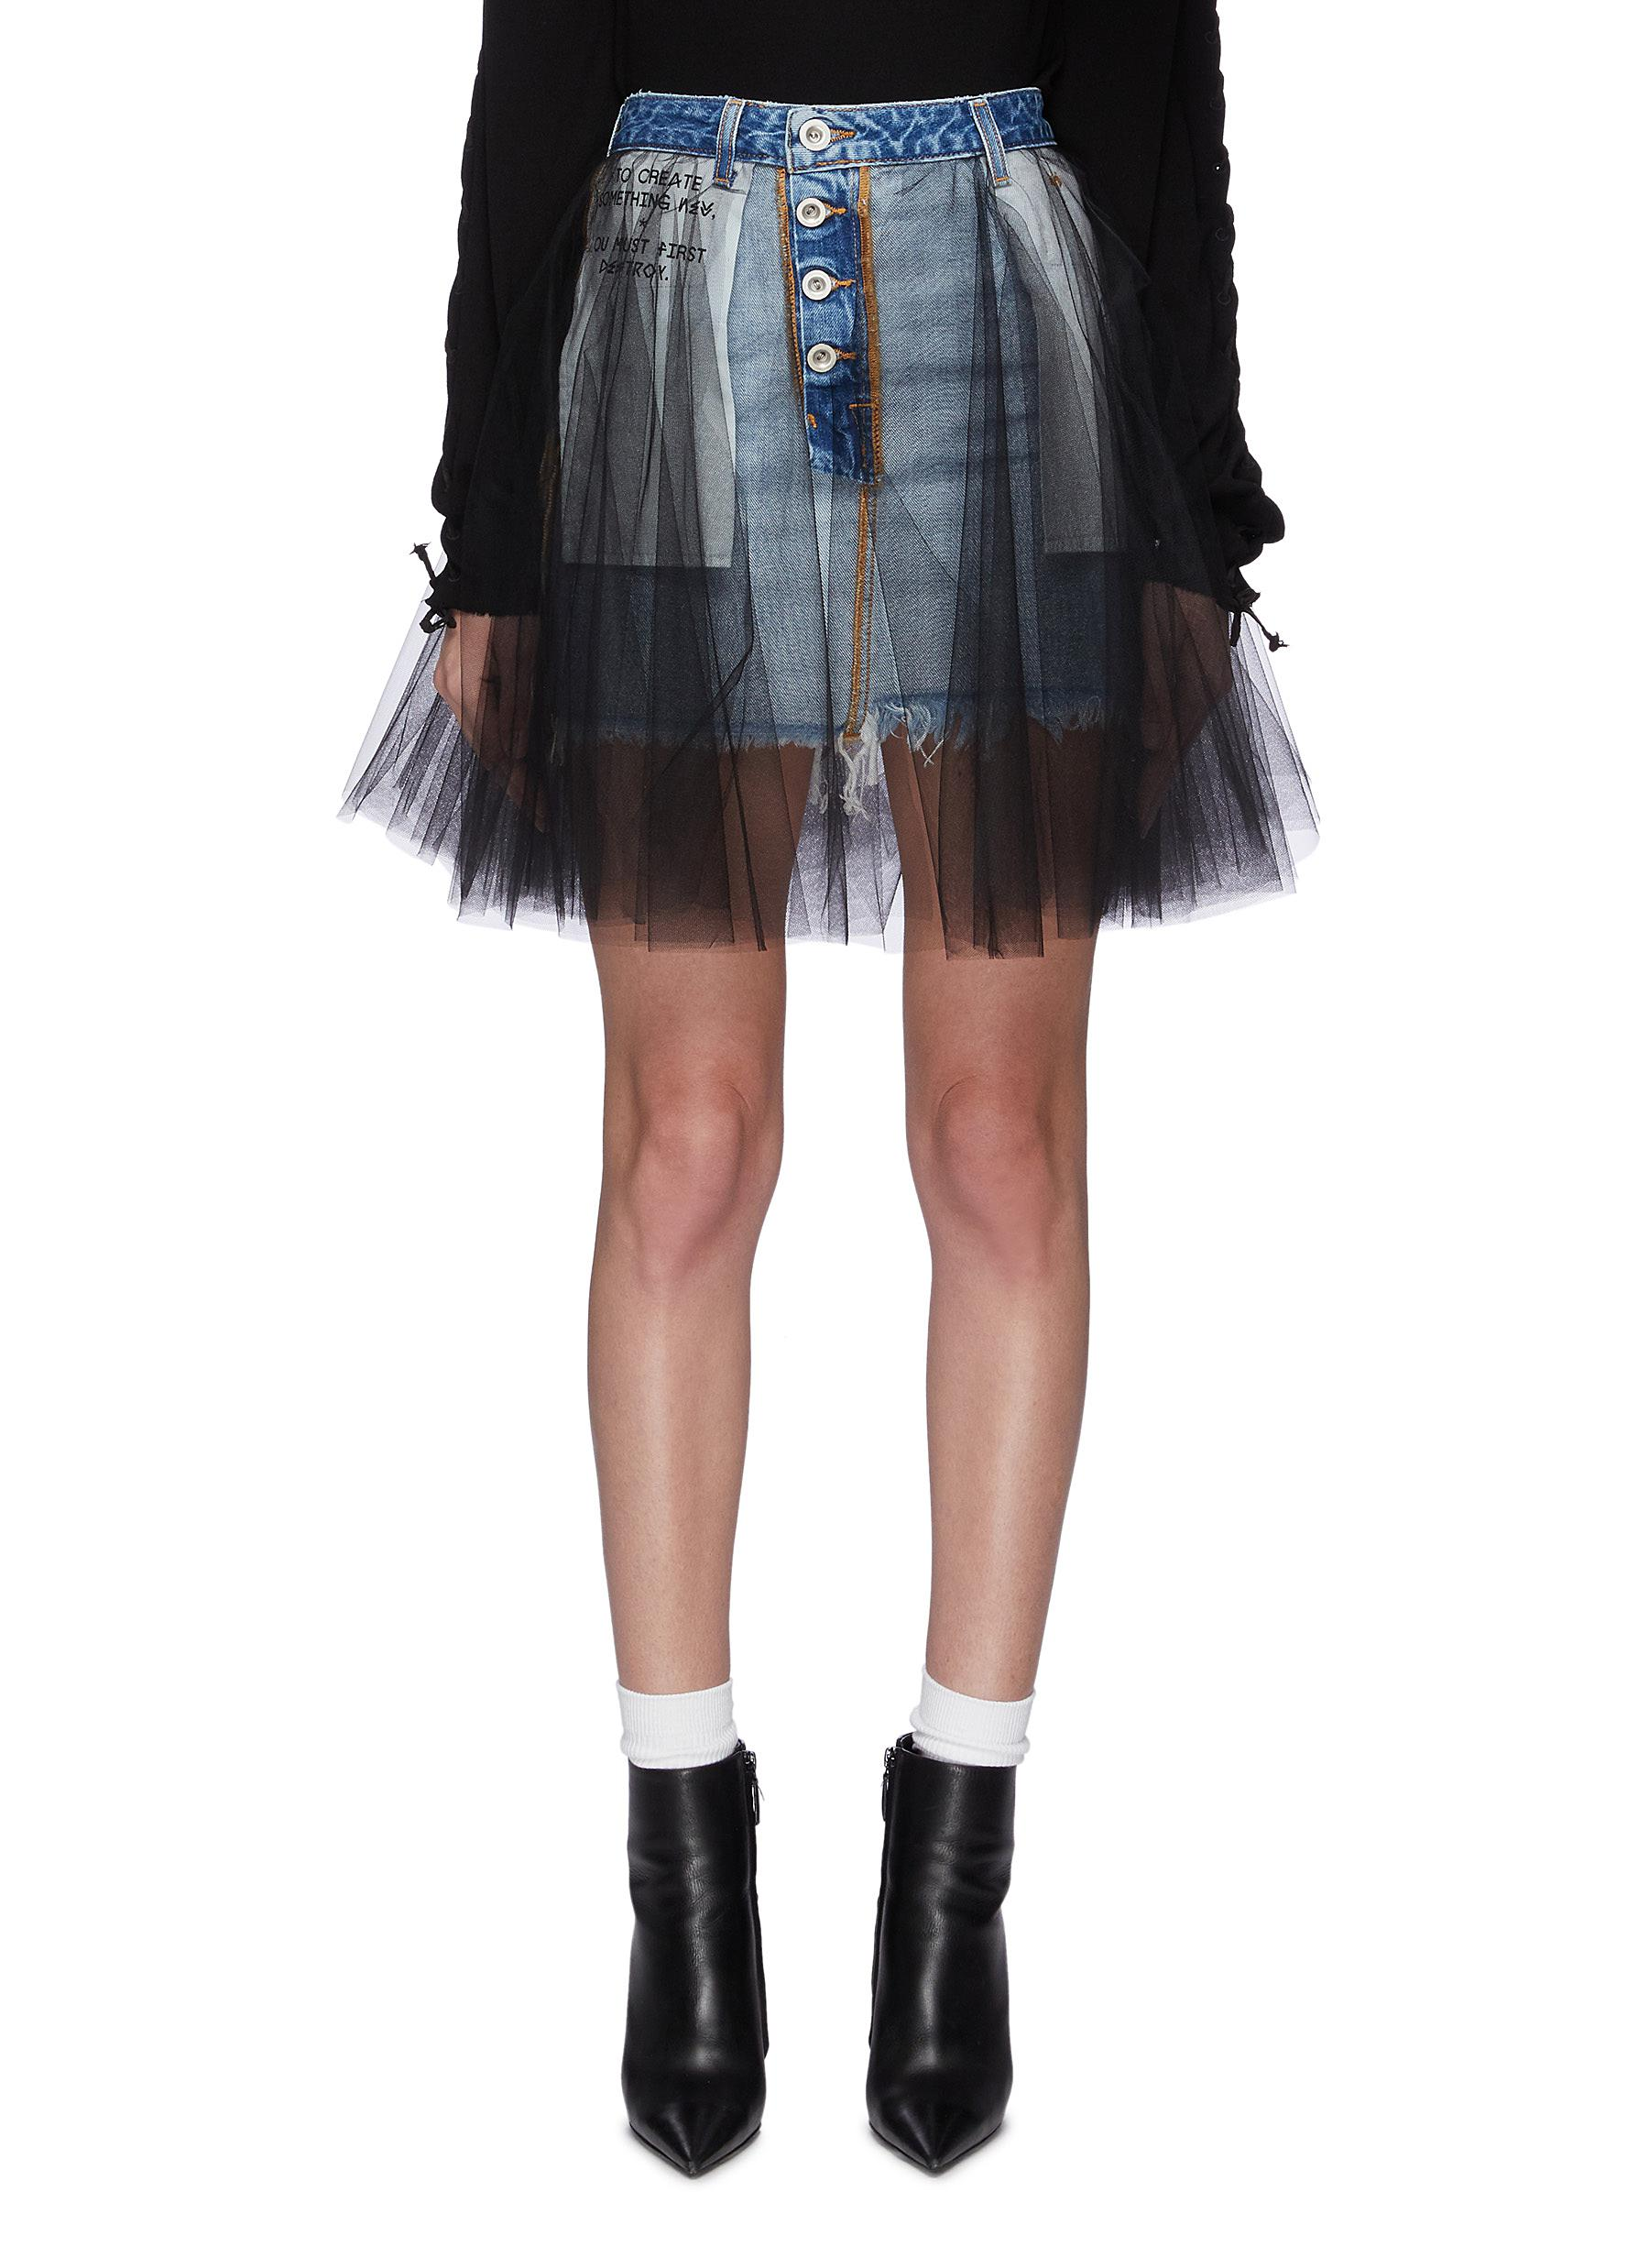 Tulle overlay denim mini skirt by Ben Taverniti Unravel Project